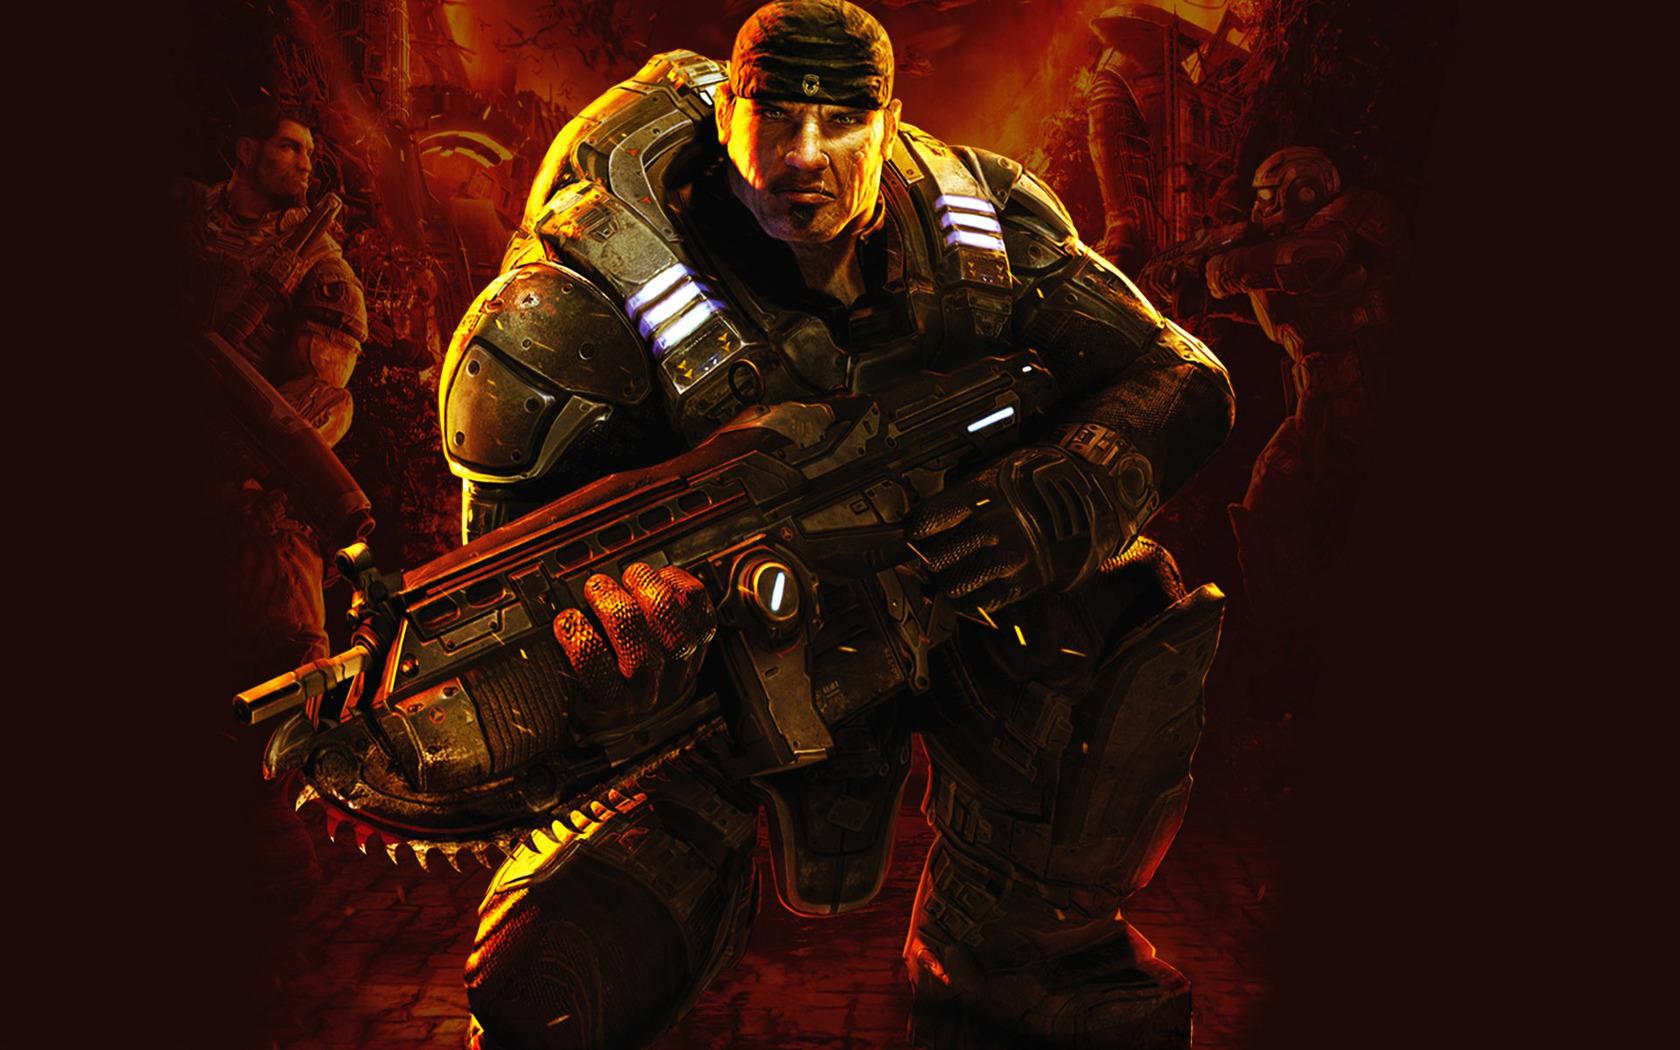 Gears Of War Wallpaper - HD Wallpaper